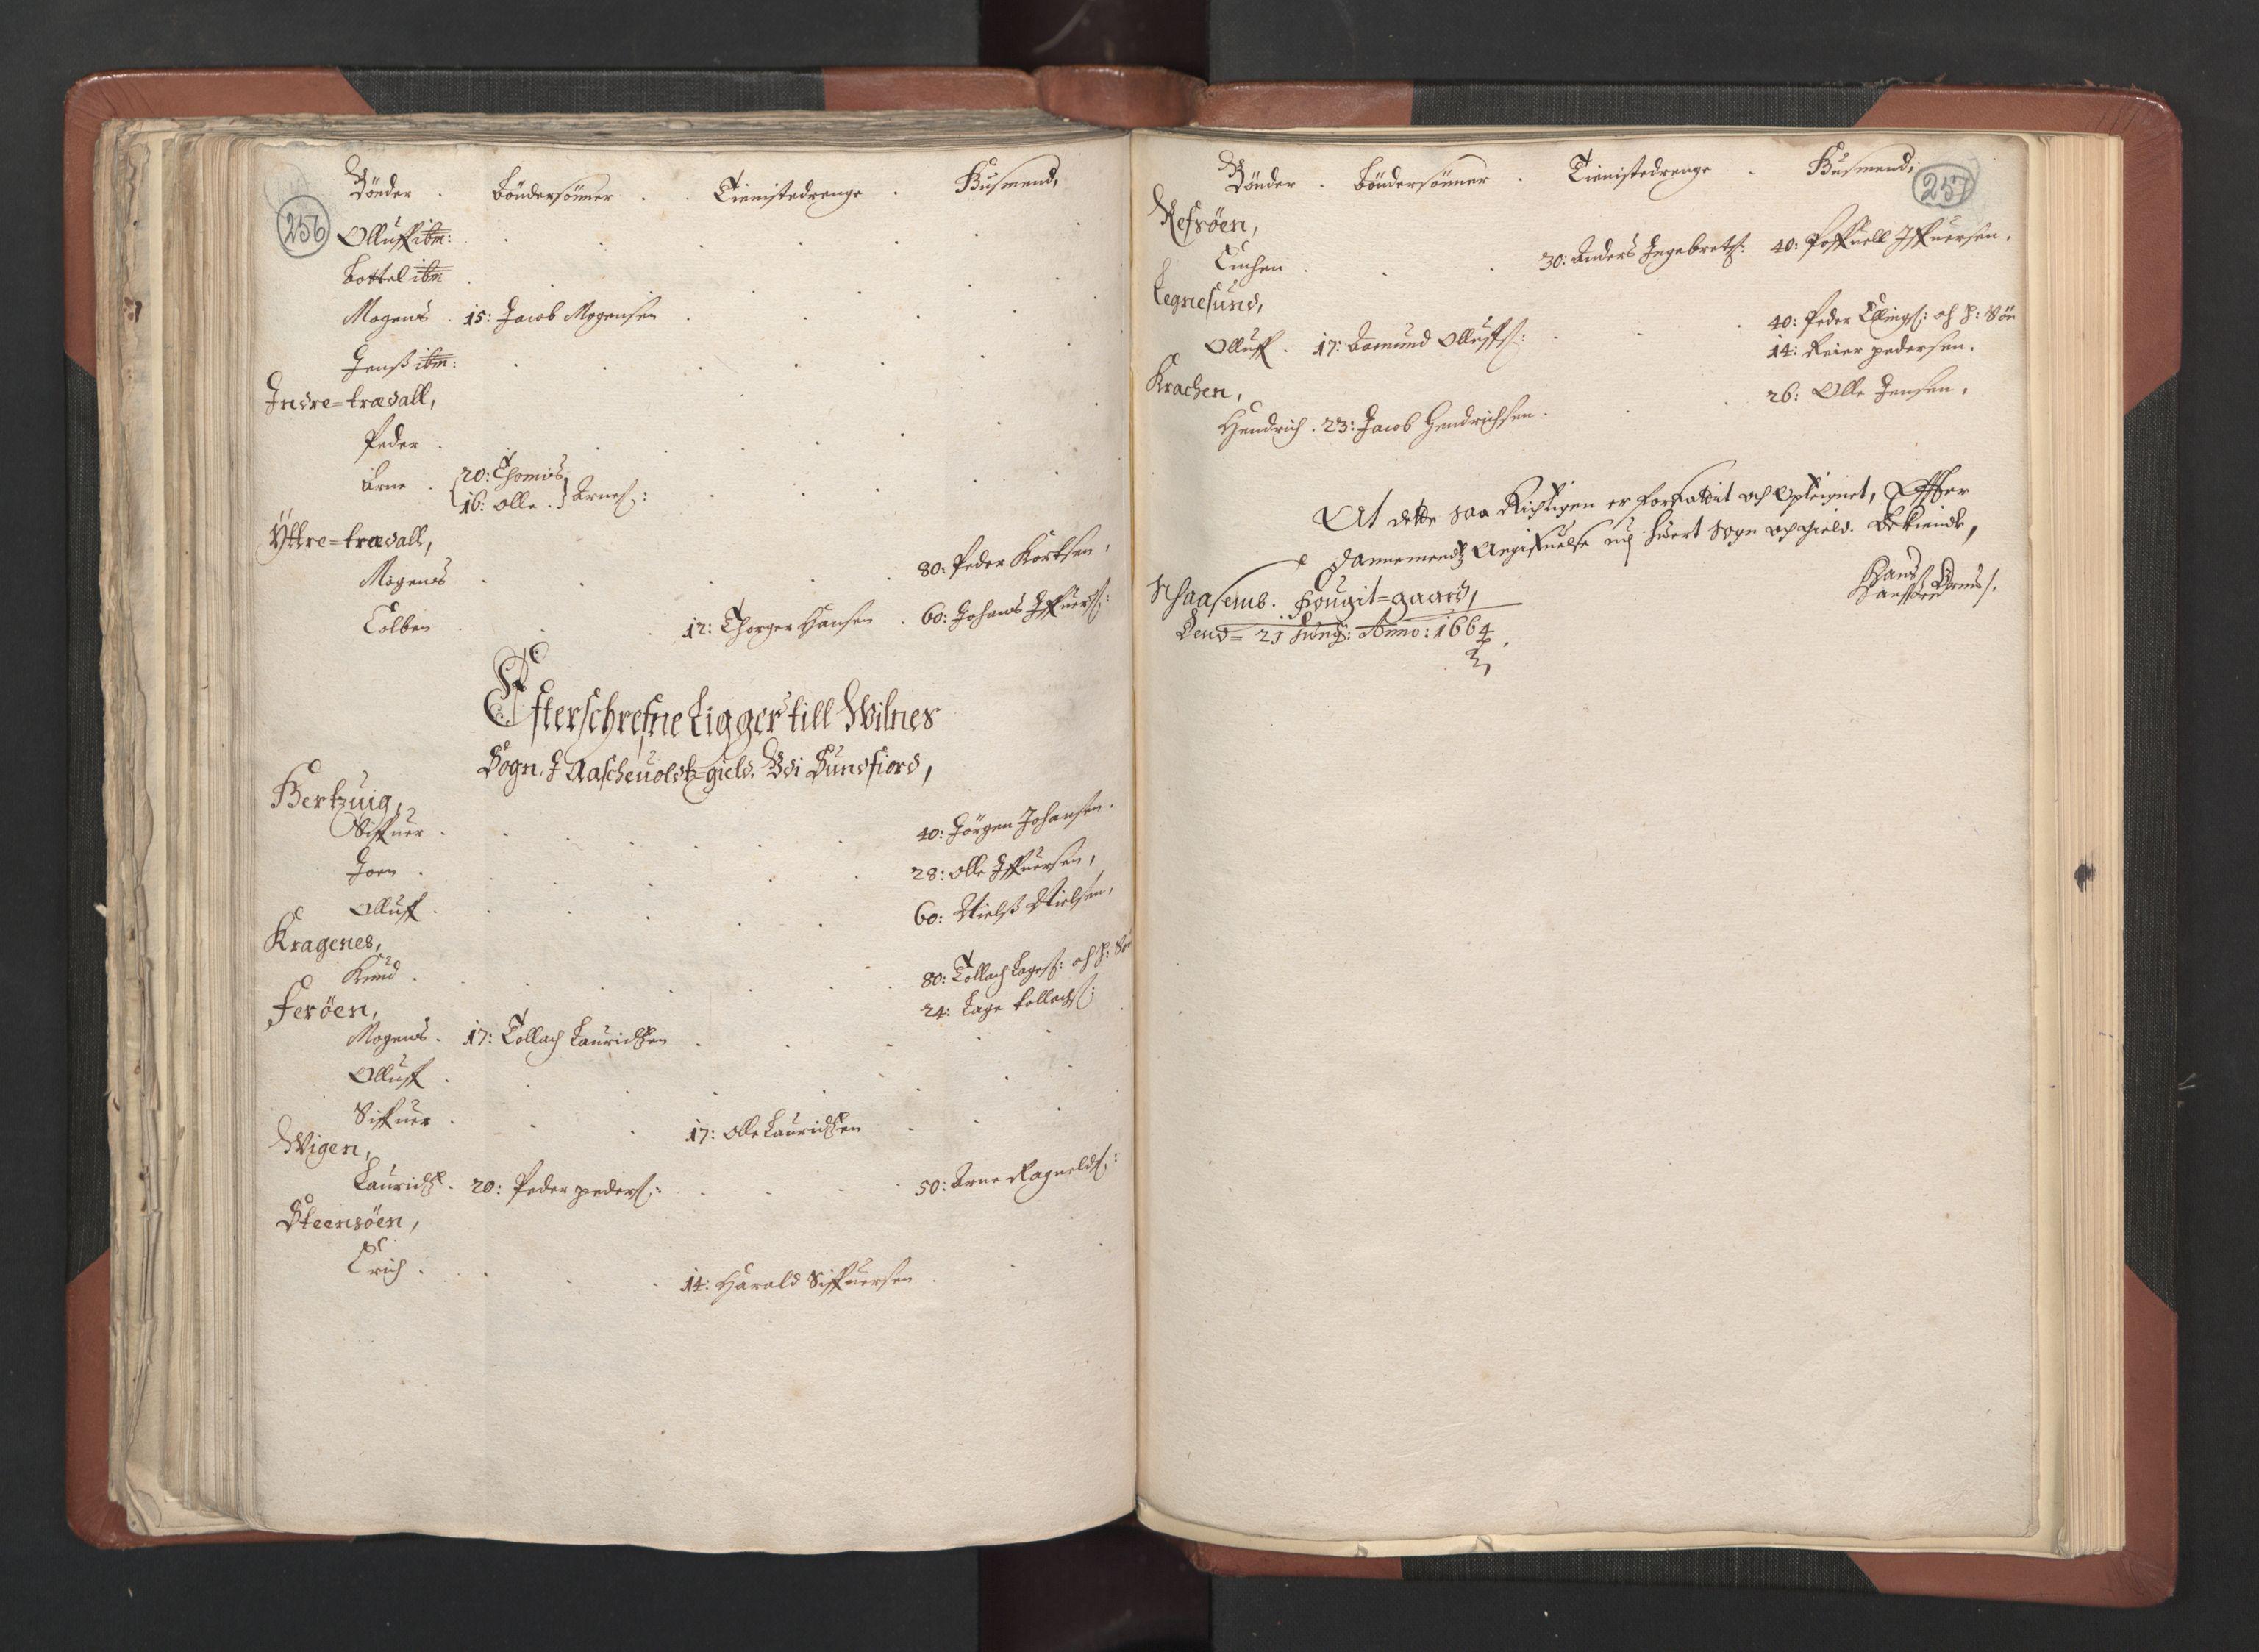 RA, Fogdenes og sorenskrivernes manntall 1664-1666, nr. 14: Hardanger len, Ytre Sogn fogderi og Indre Sogn fogderi, 1664-1665, s. 256-257